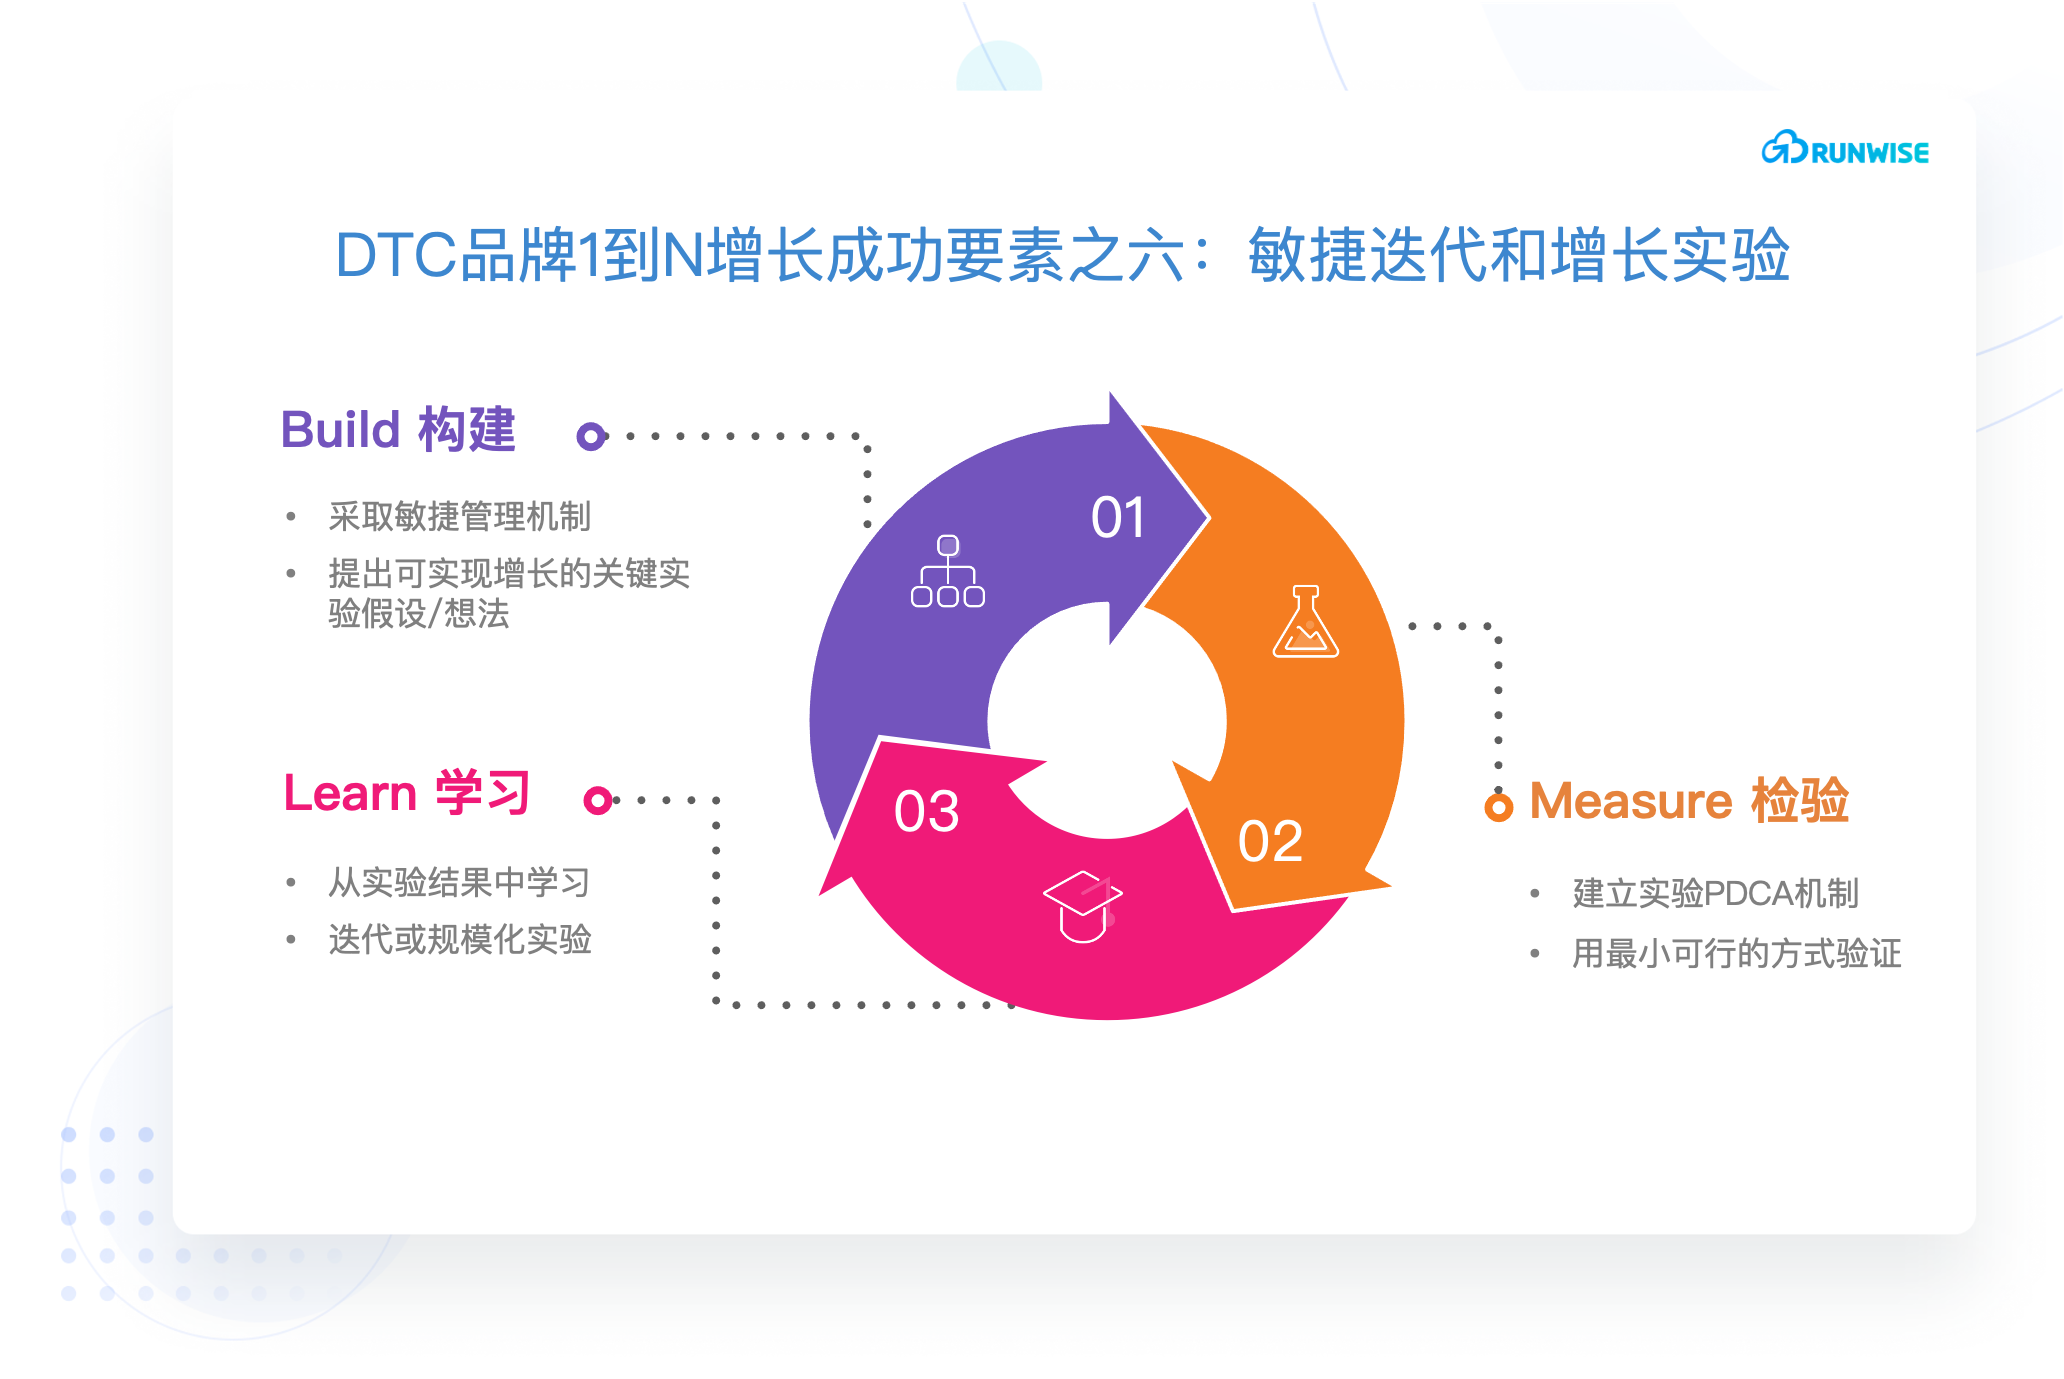 DTC品牌增长创新-敏捷迭代和增长实验